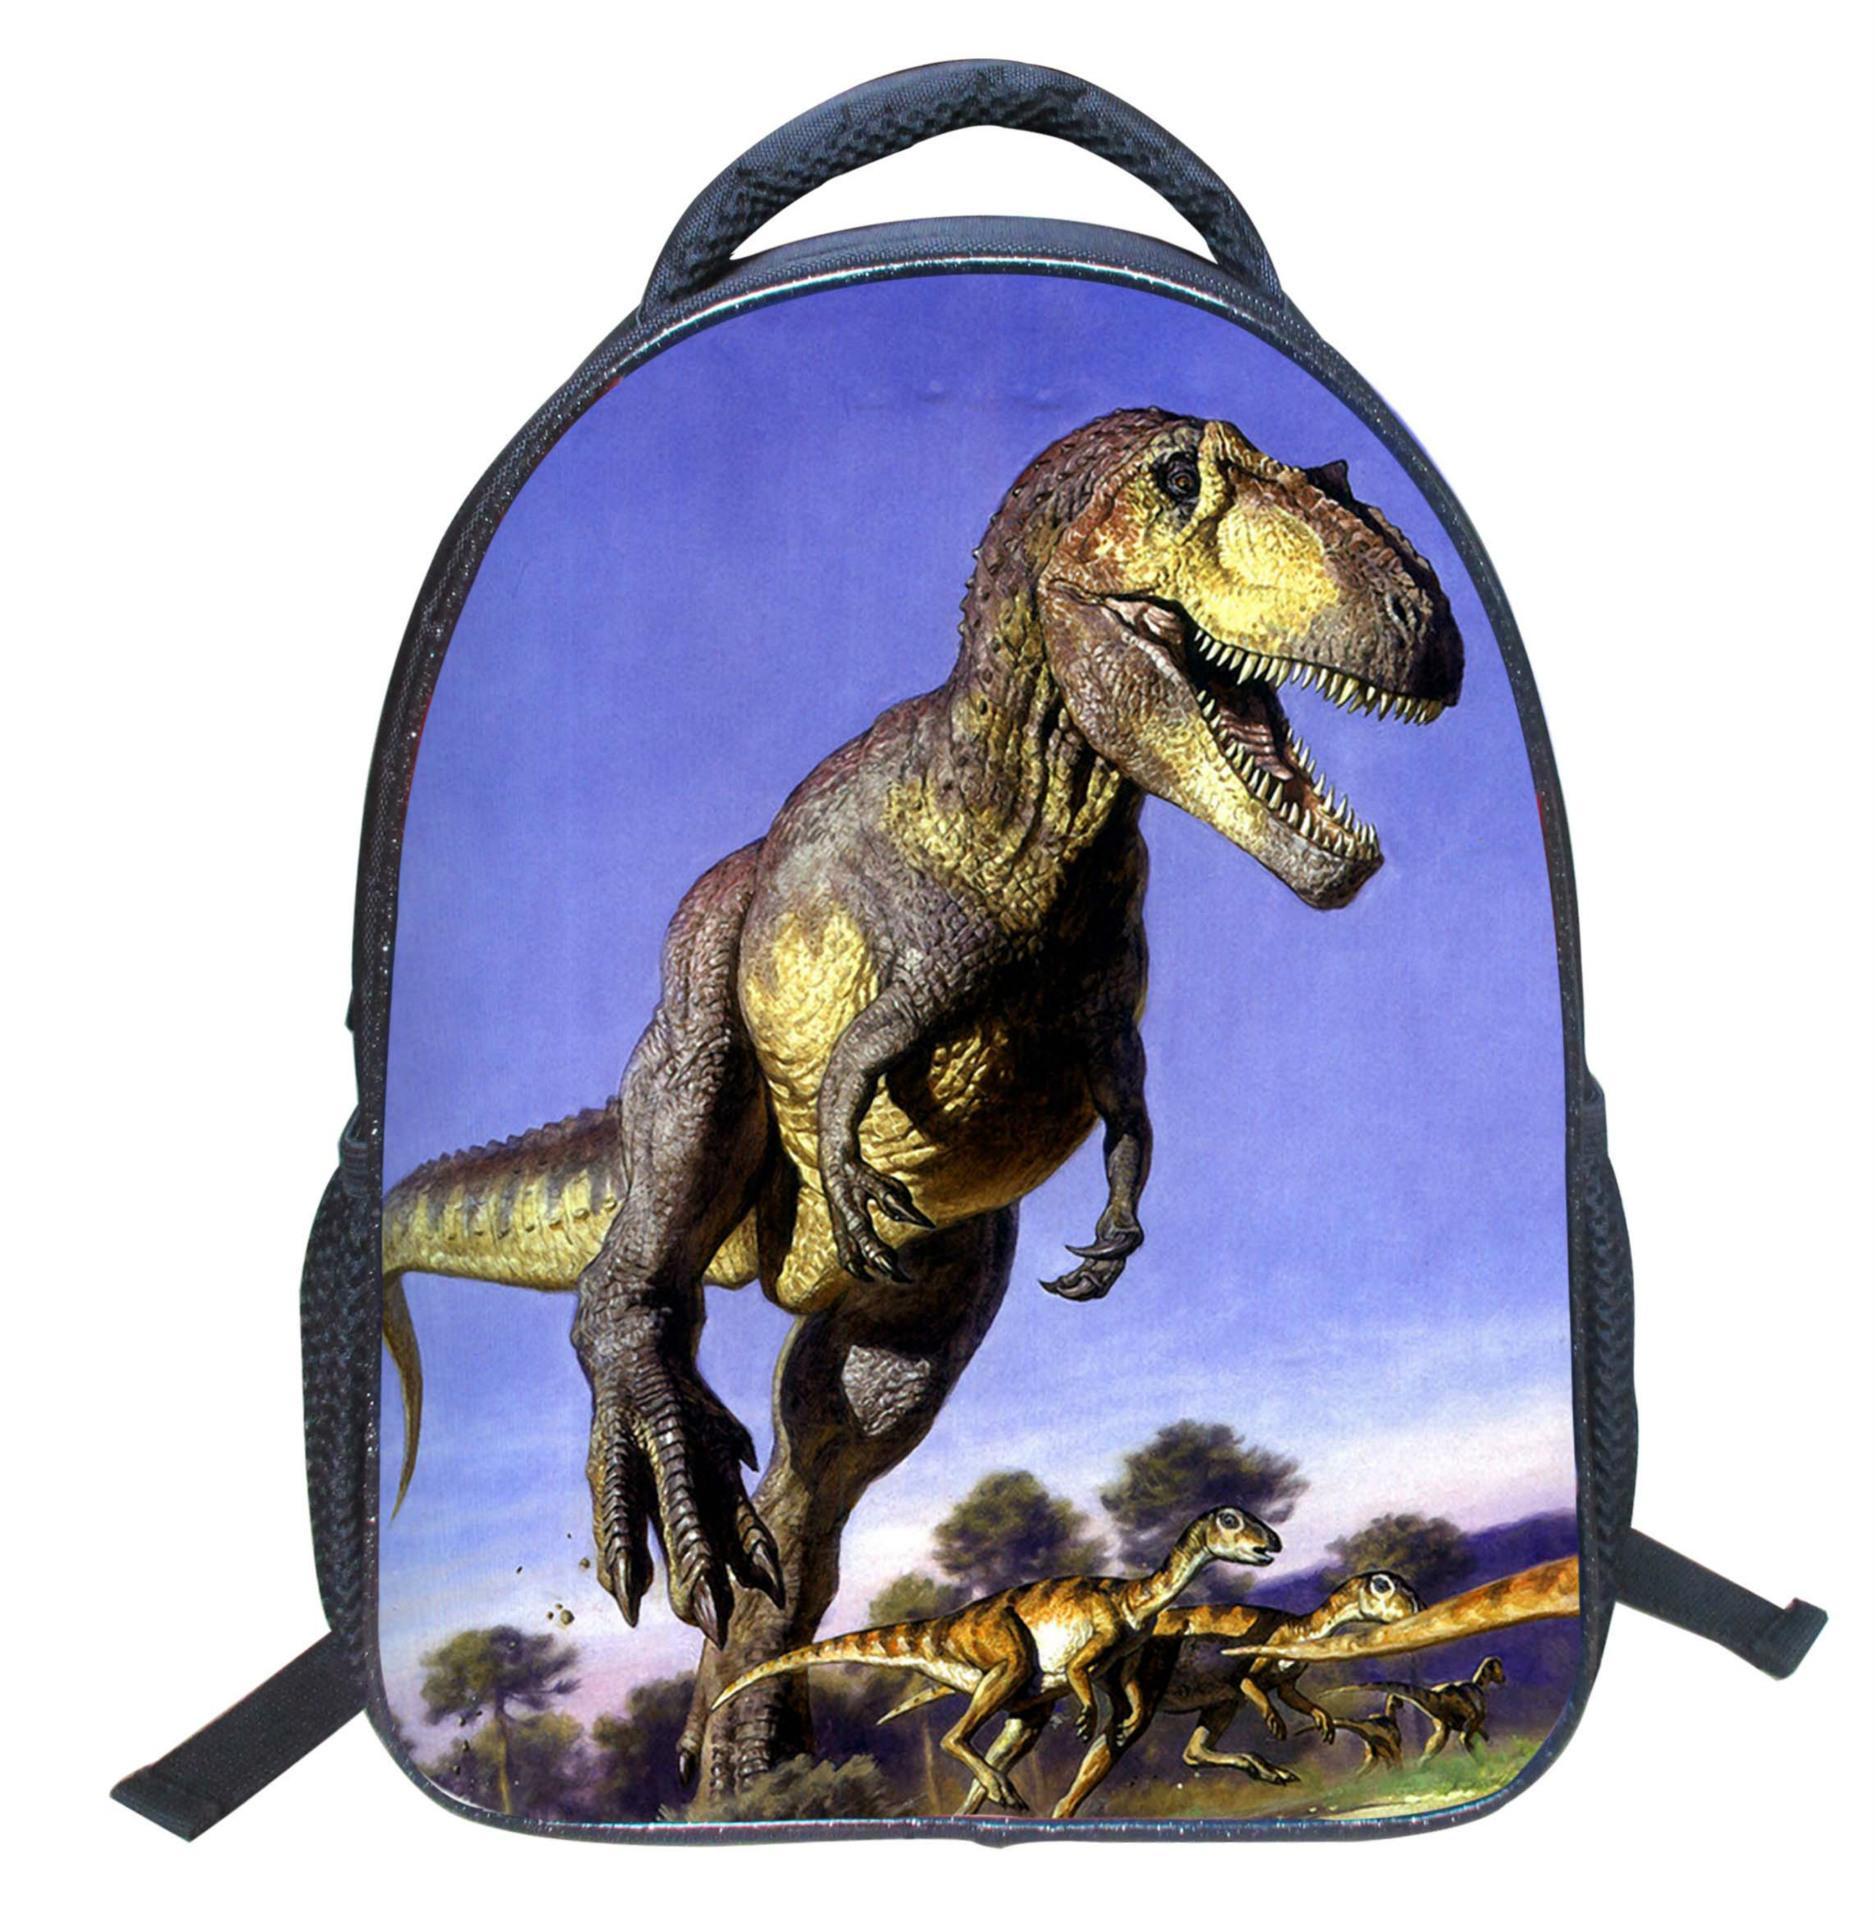 Giá bán Childrens Cartoon Bag, 14-inch Dinosaur Schoolbag Backpack Shoulder Bag - intl